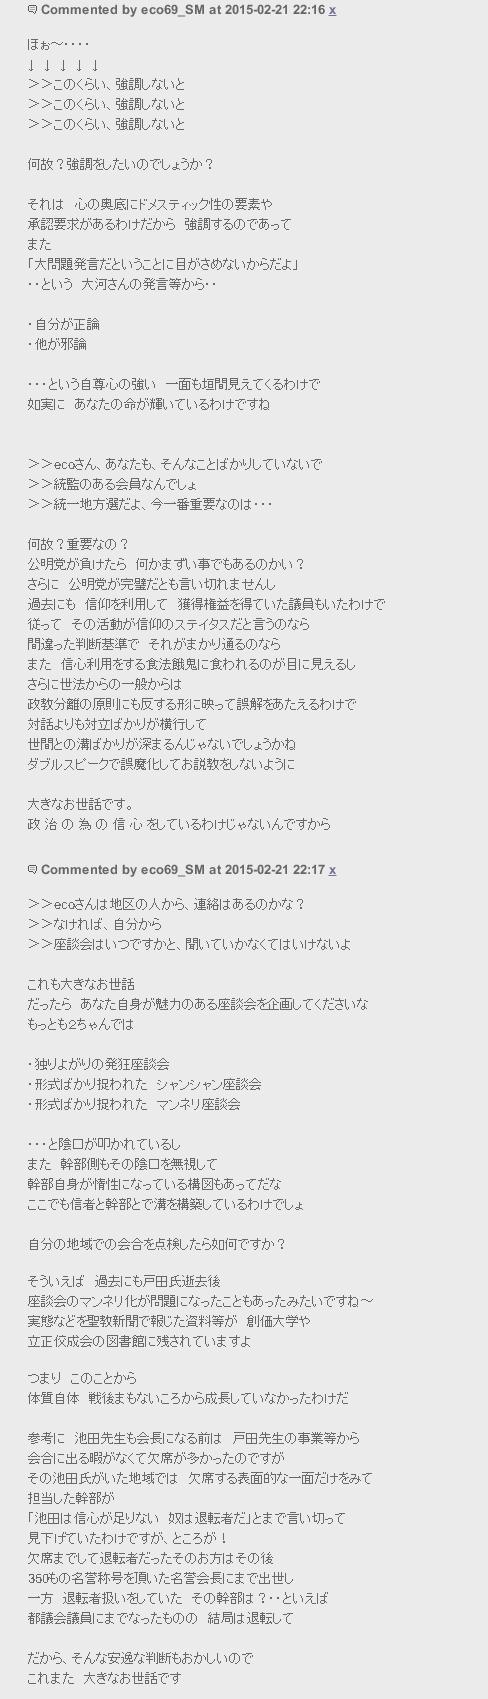 tomochiyo_vs_taigaB.png